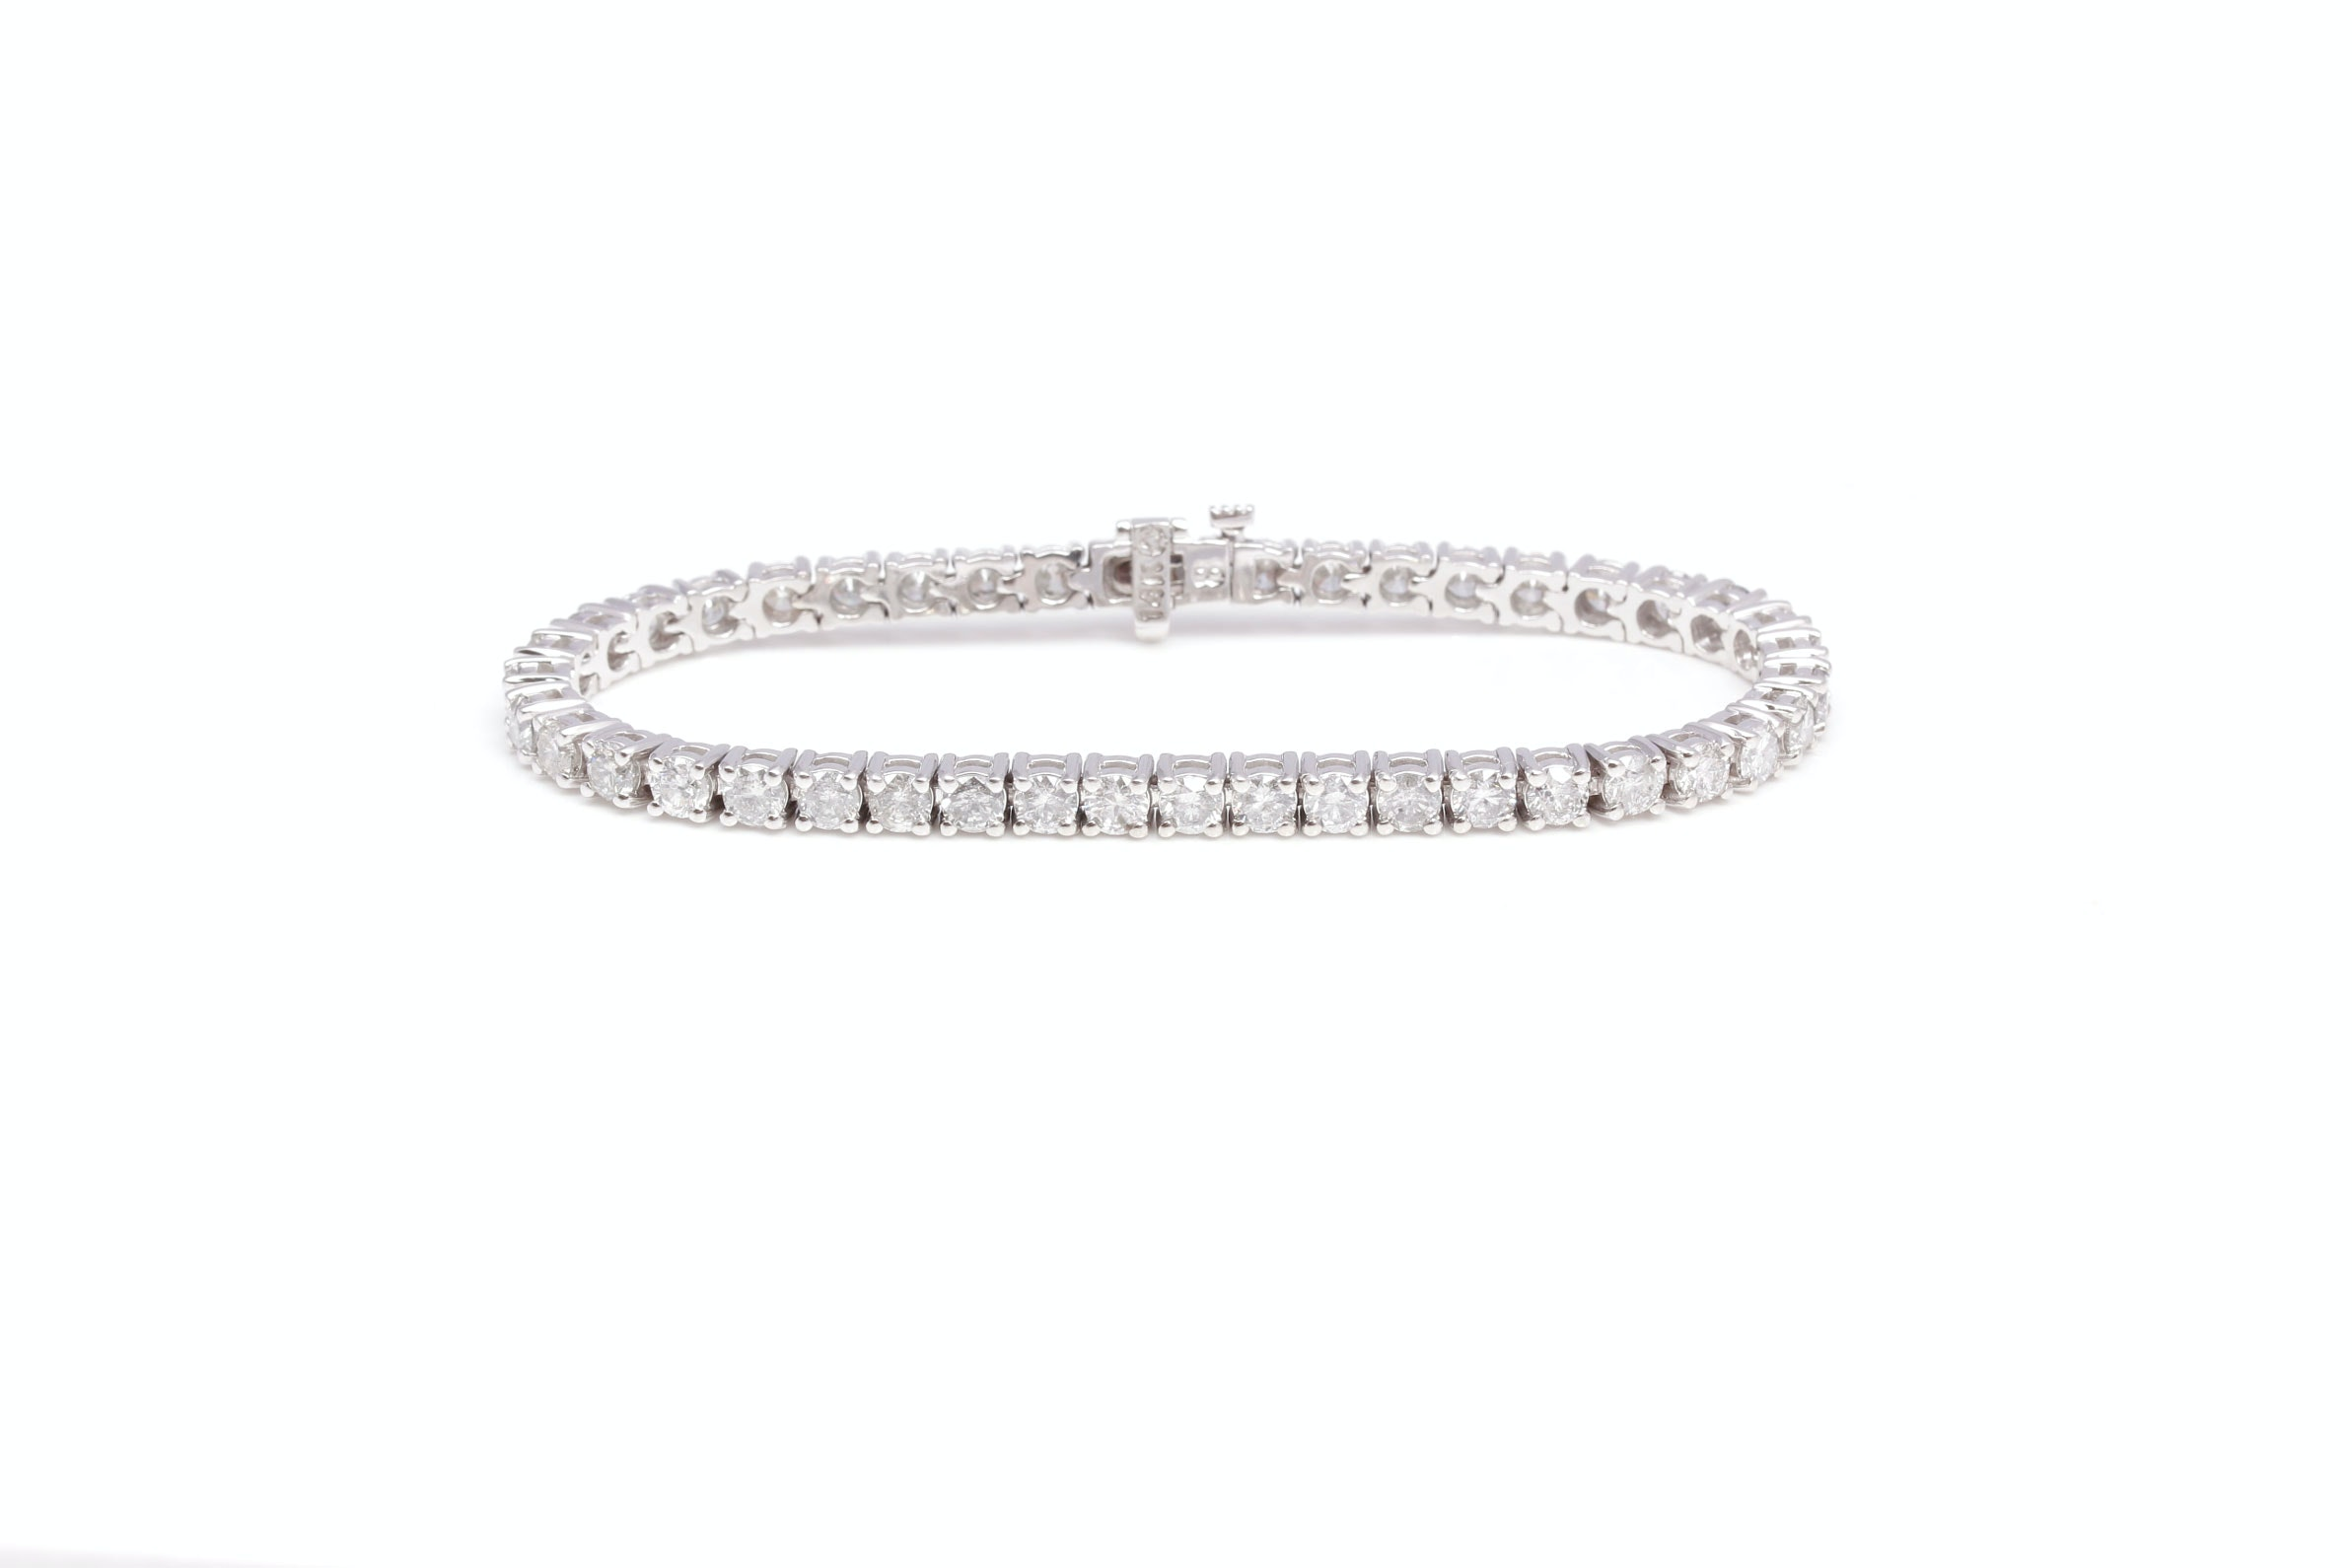 14K White Gold 8.27 CTW Diamond Bracelet